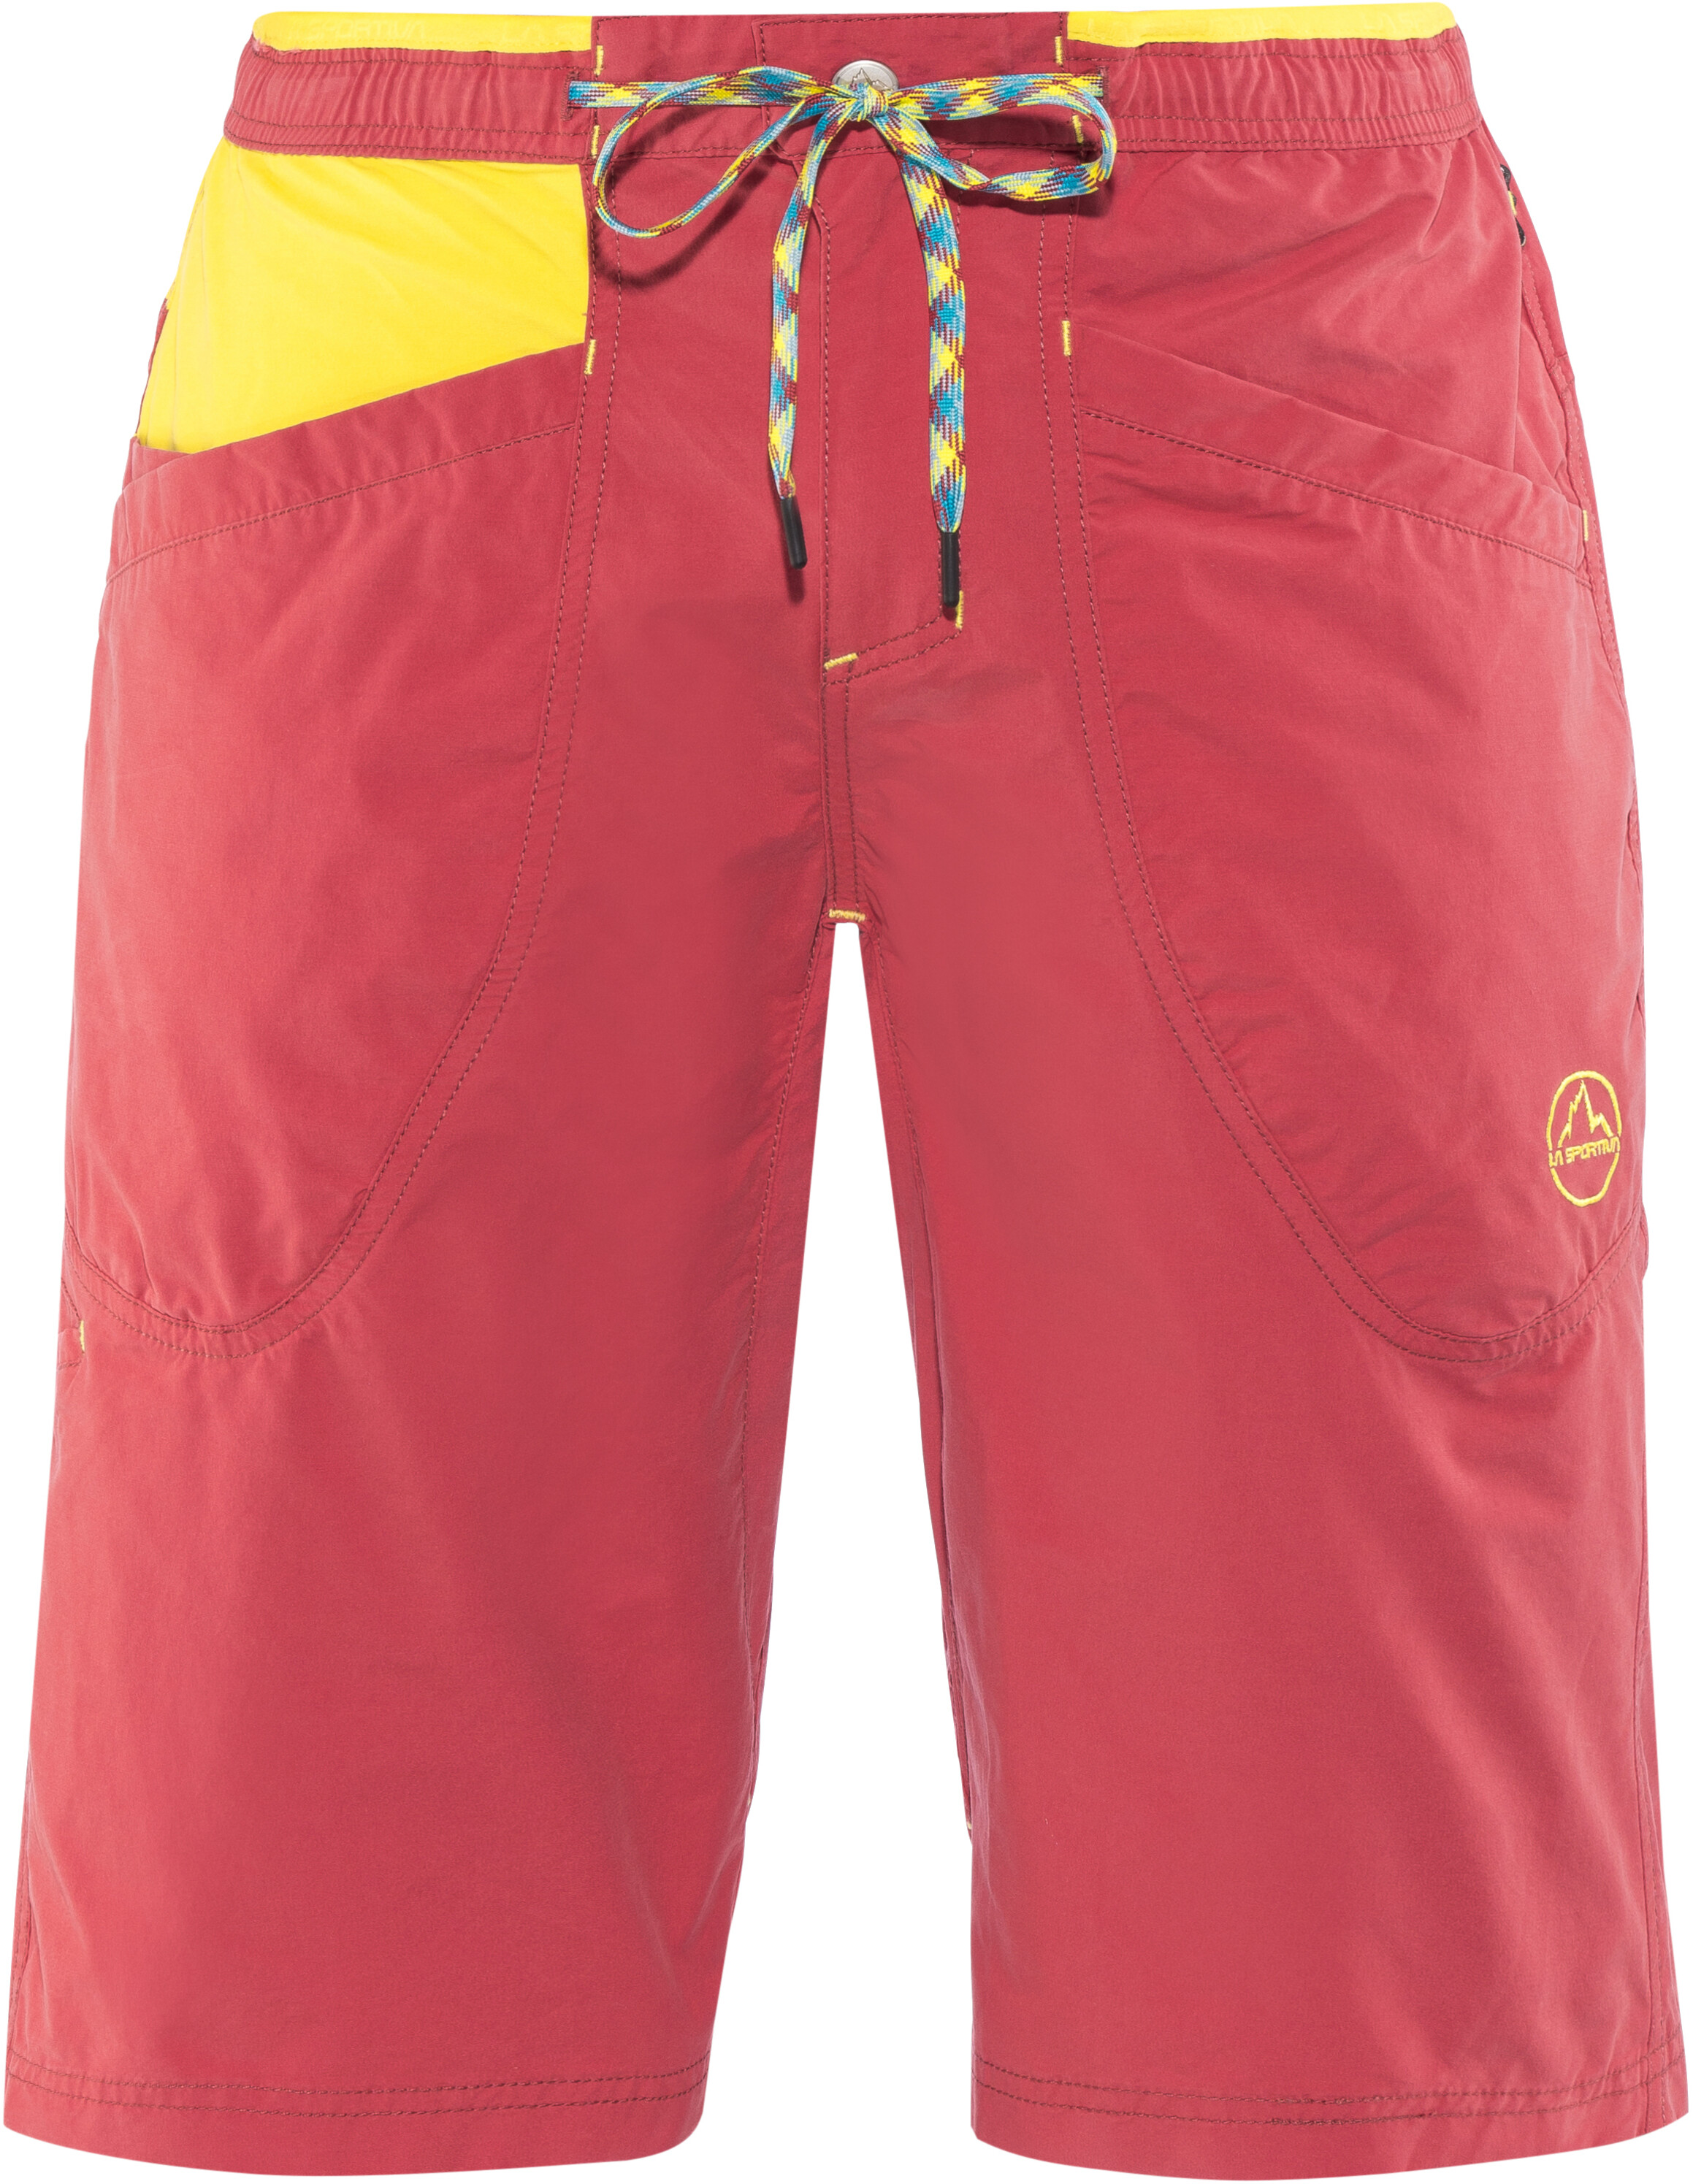 8382dca17f La Sportiva Leader Shorts Men red at Addnature.co.uk